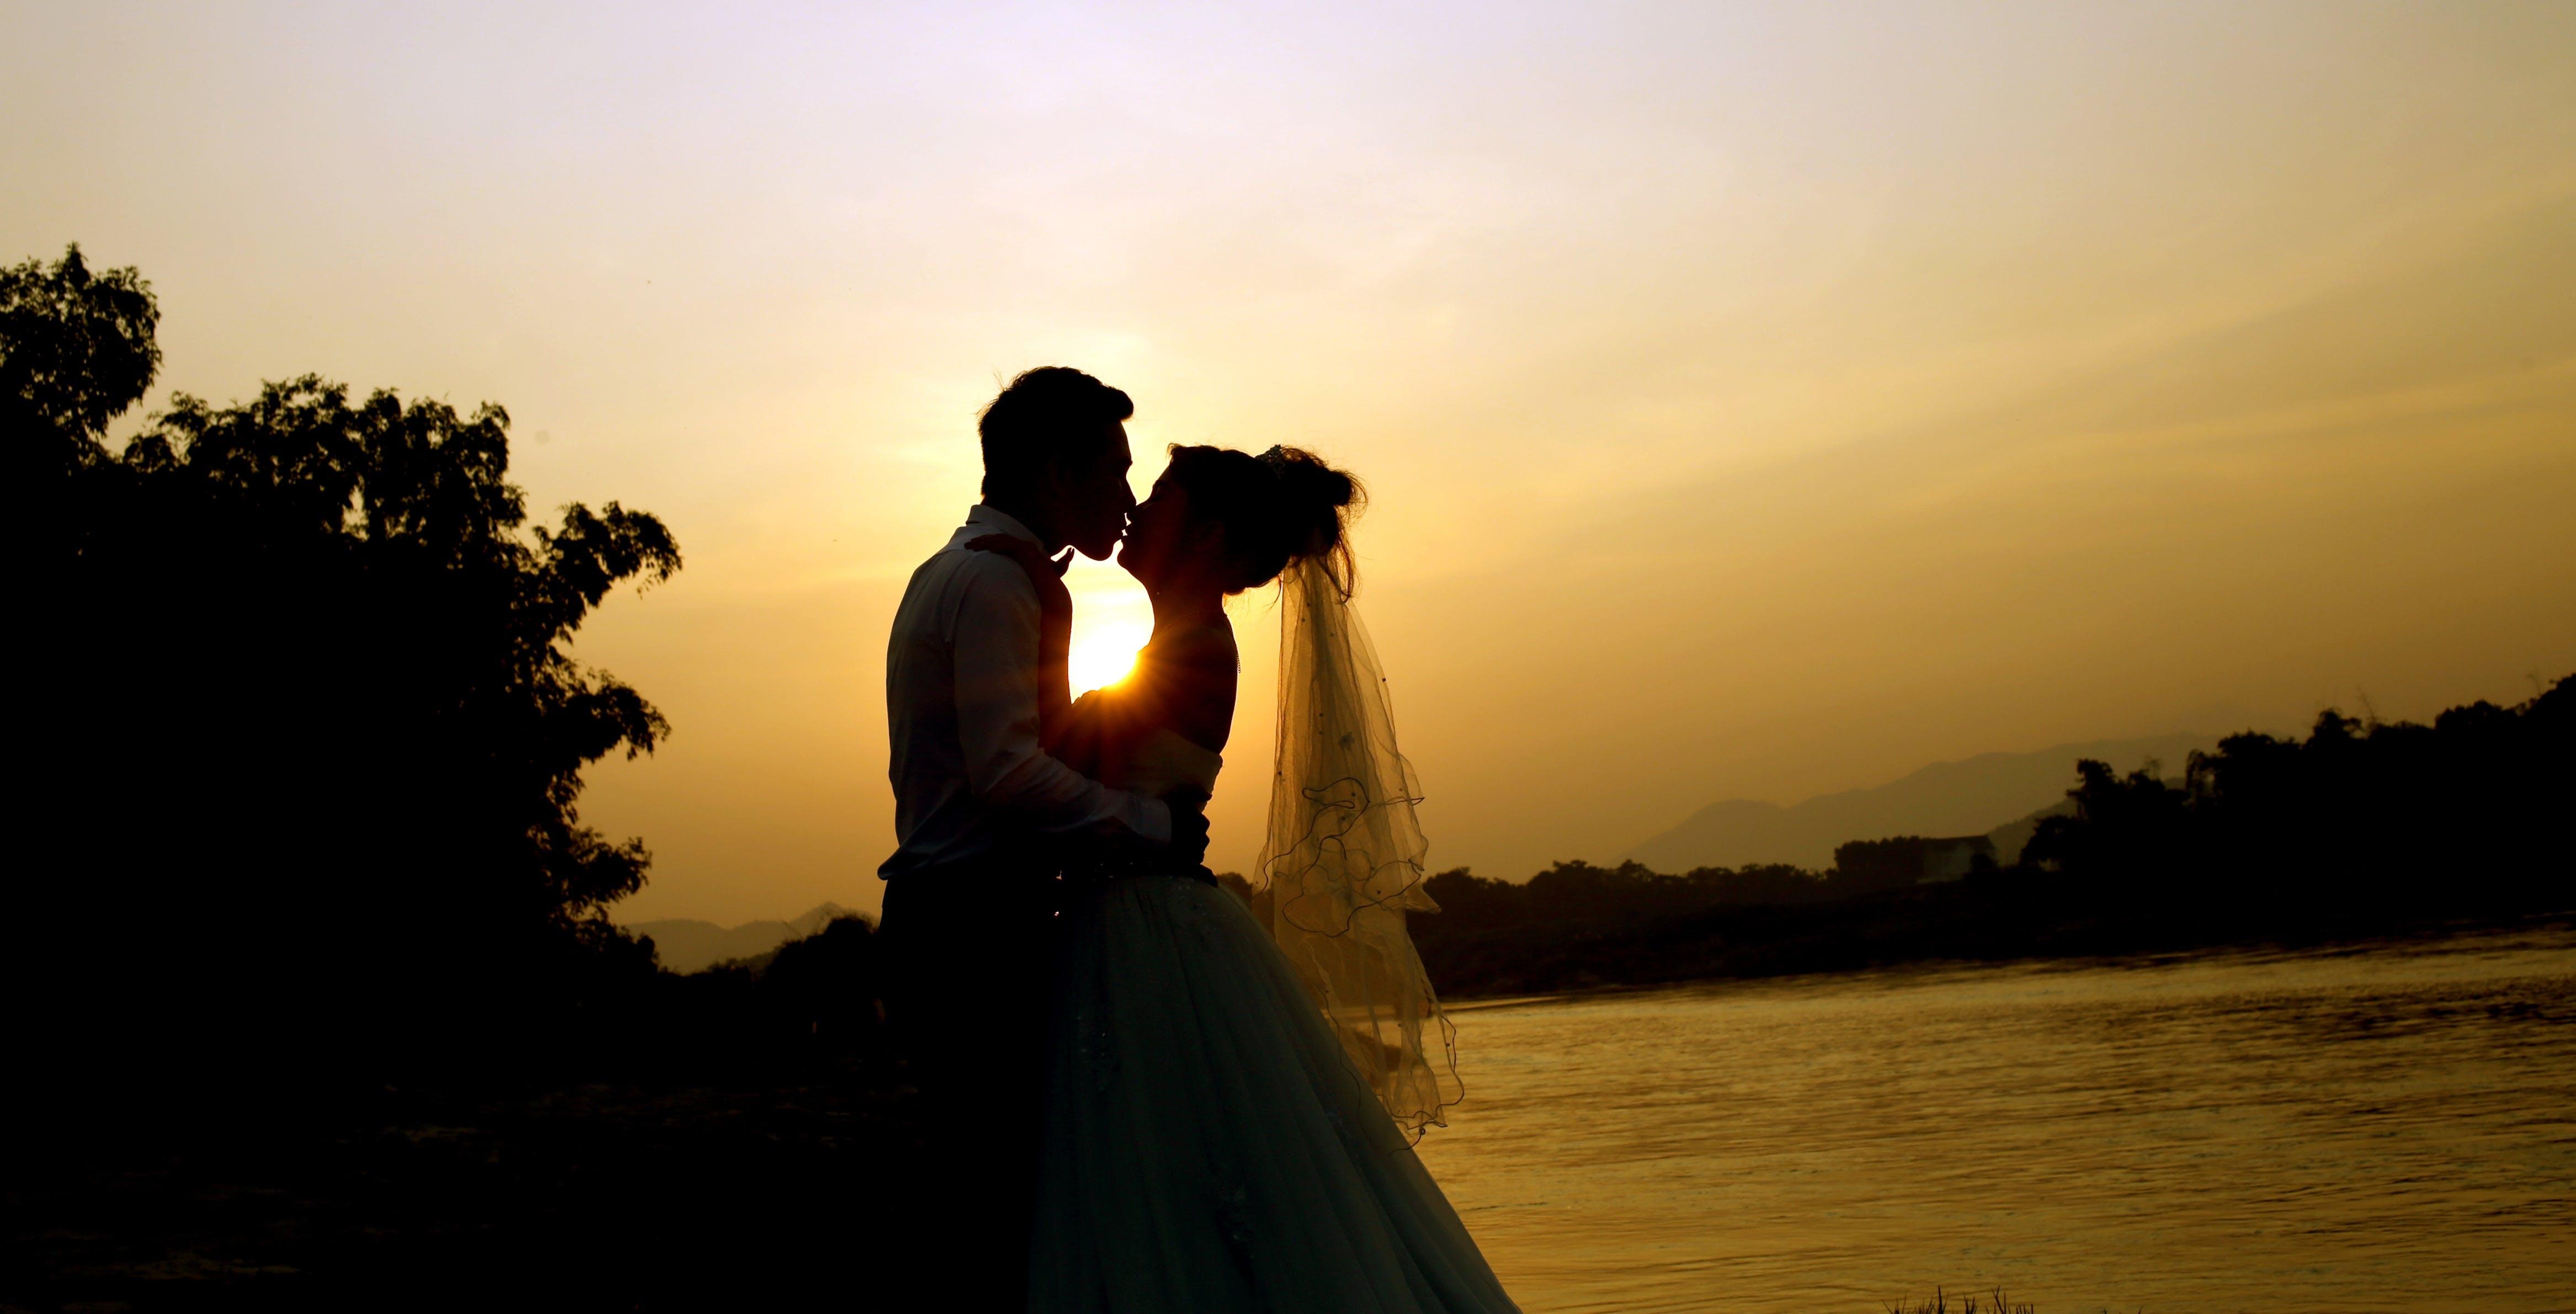 Man Kissing Woman Near Body of Water